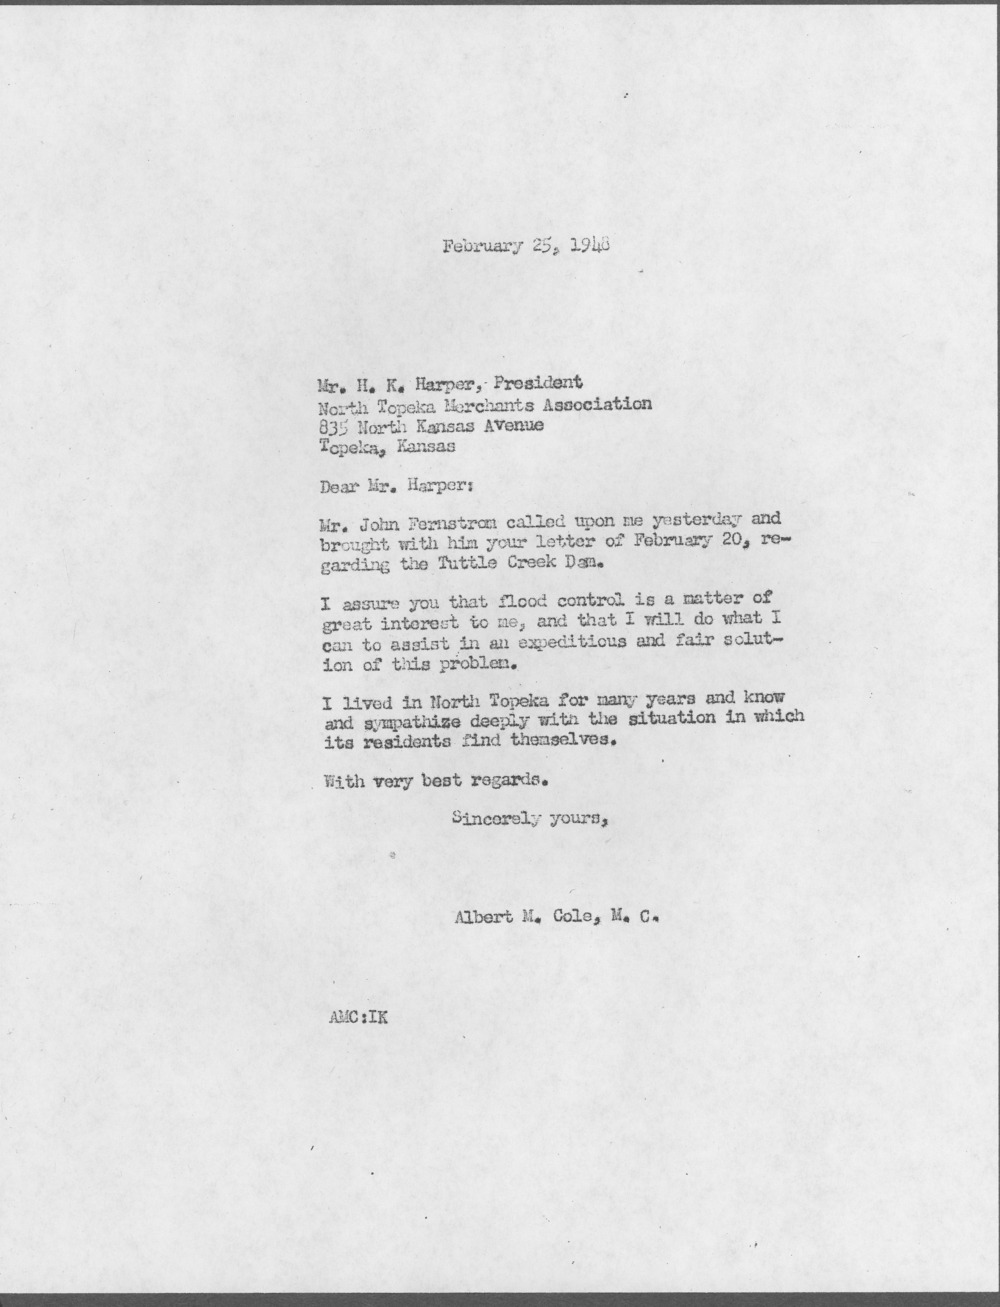 H. K. Harper to Representative Albert Cole - 2